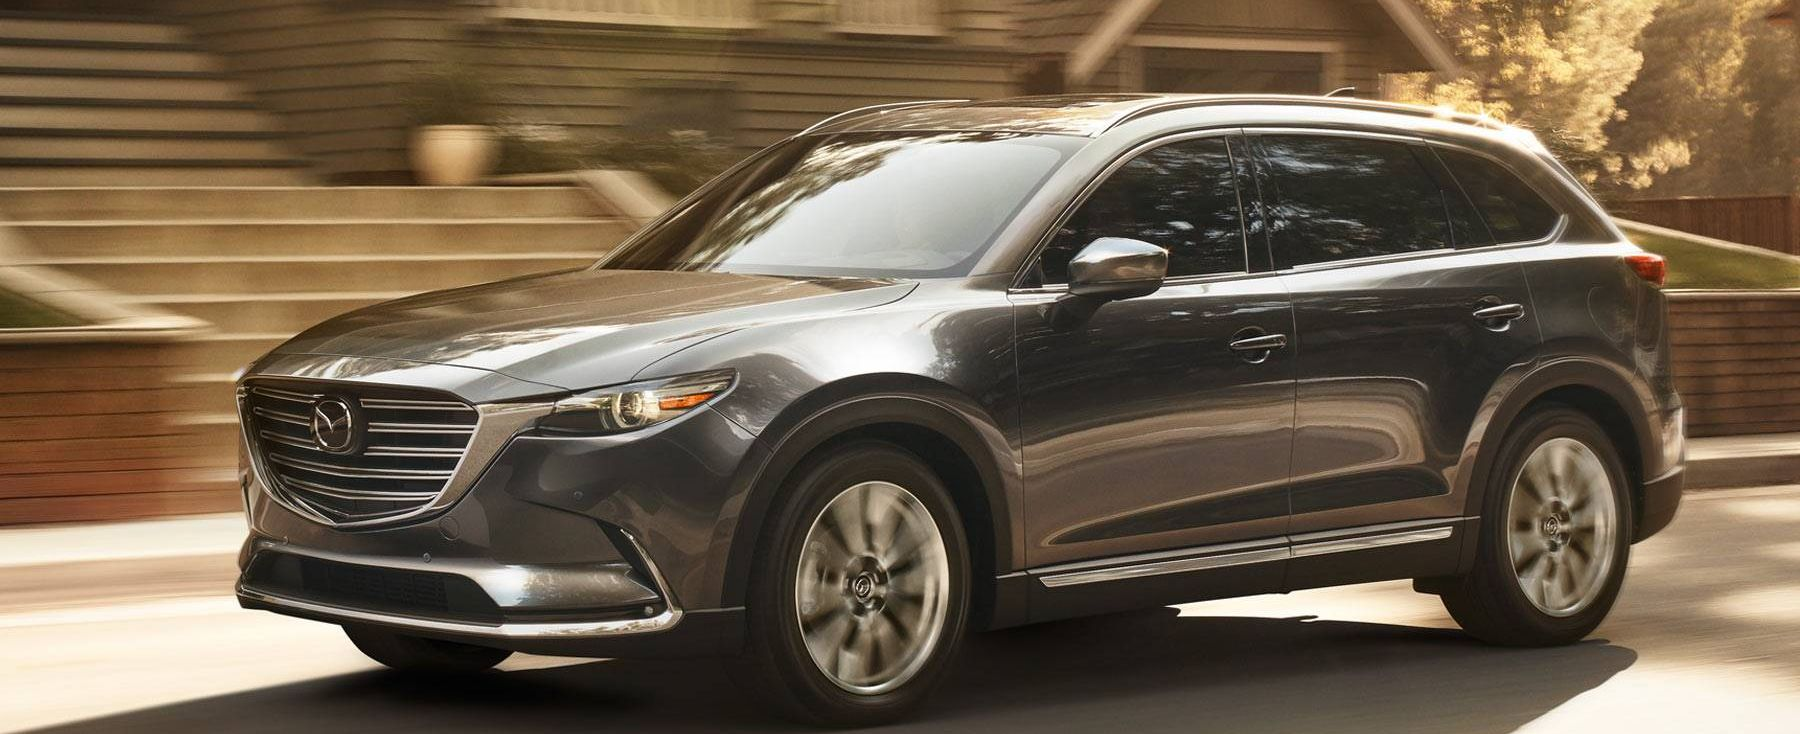 2019 Mazda CX-9 Financing near Ann Arbor, MI